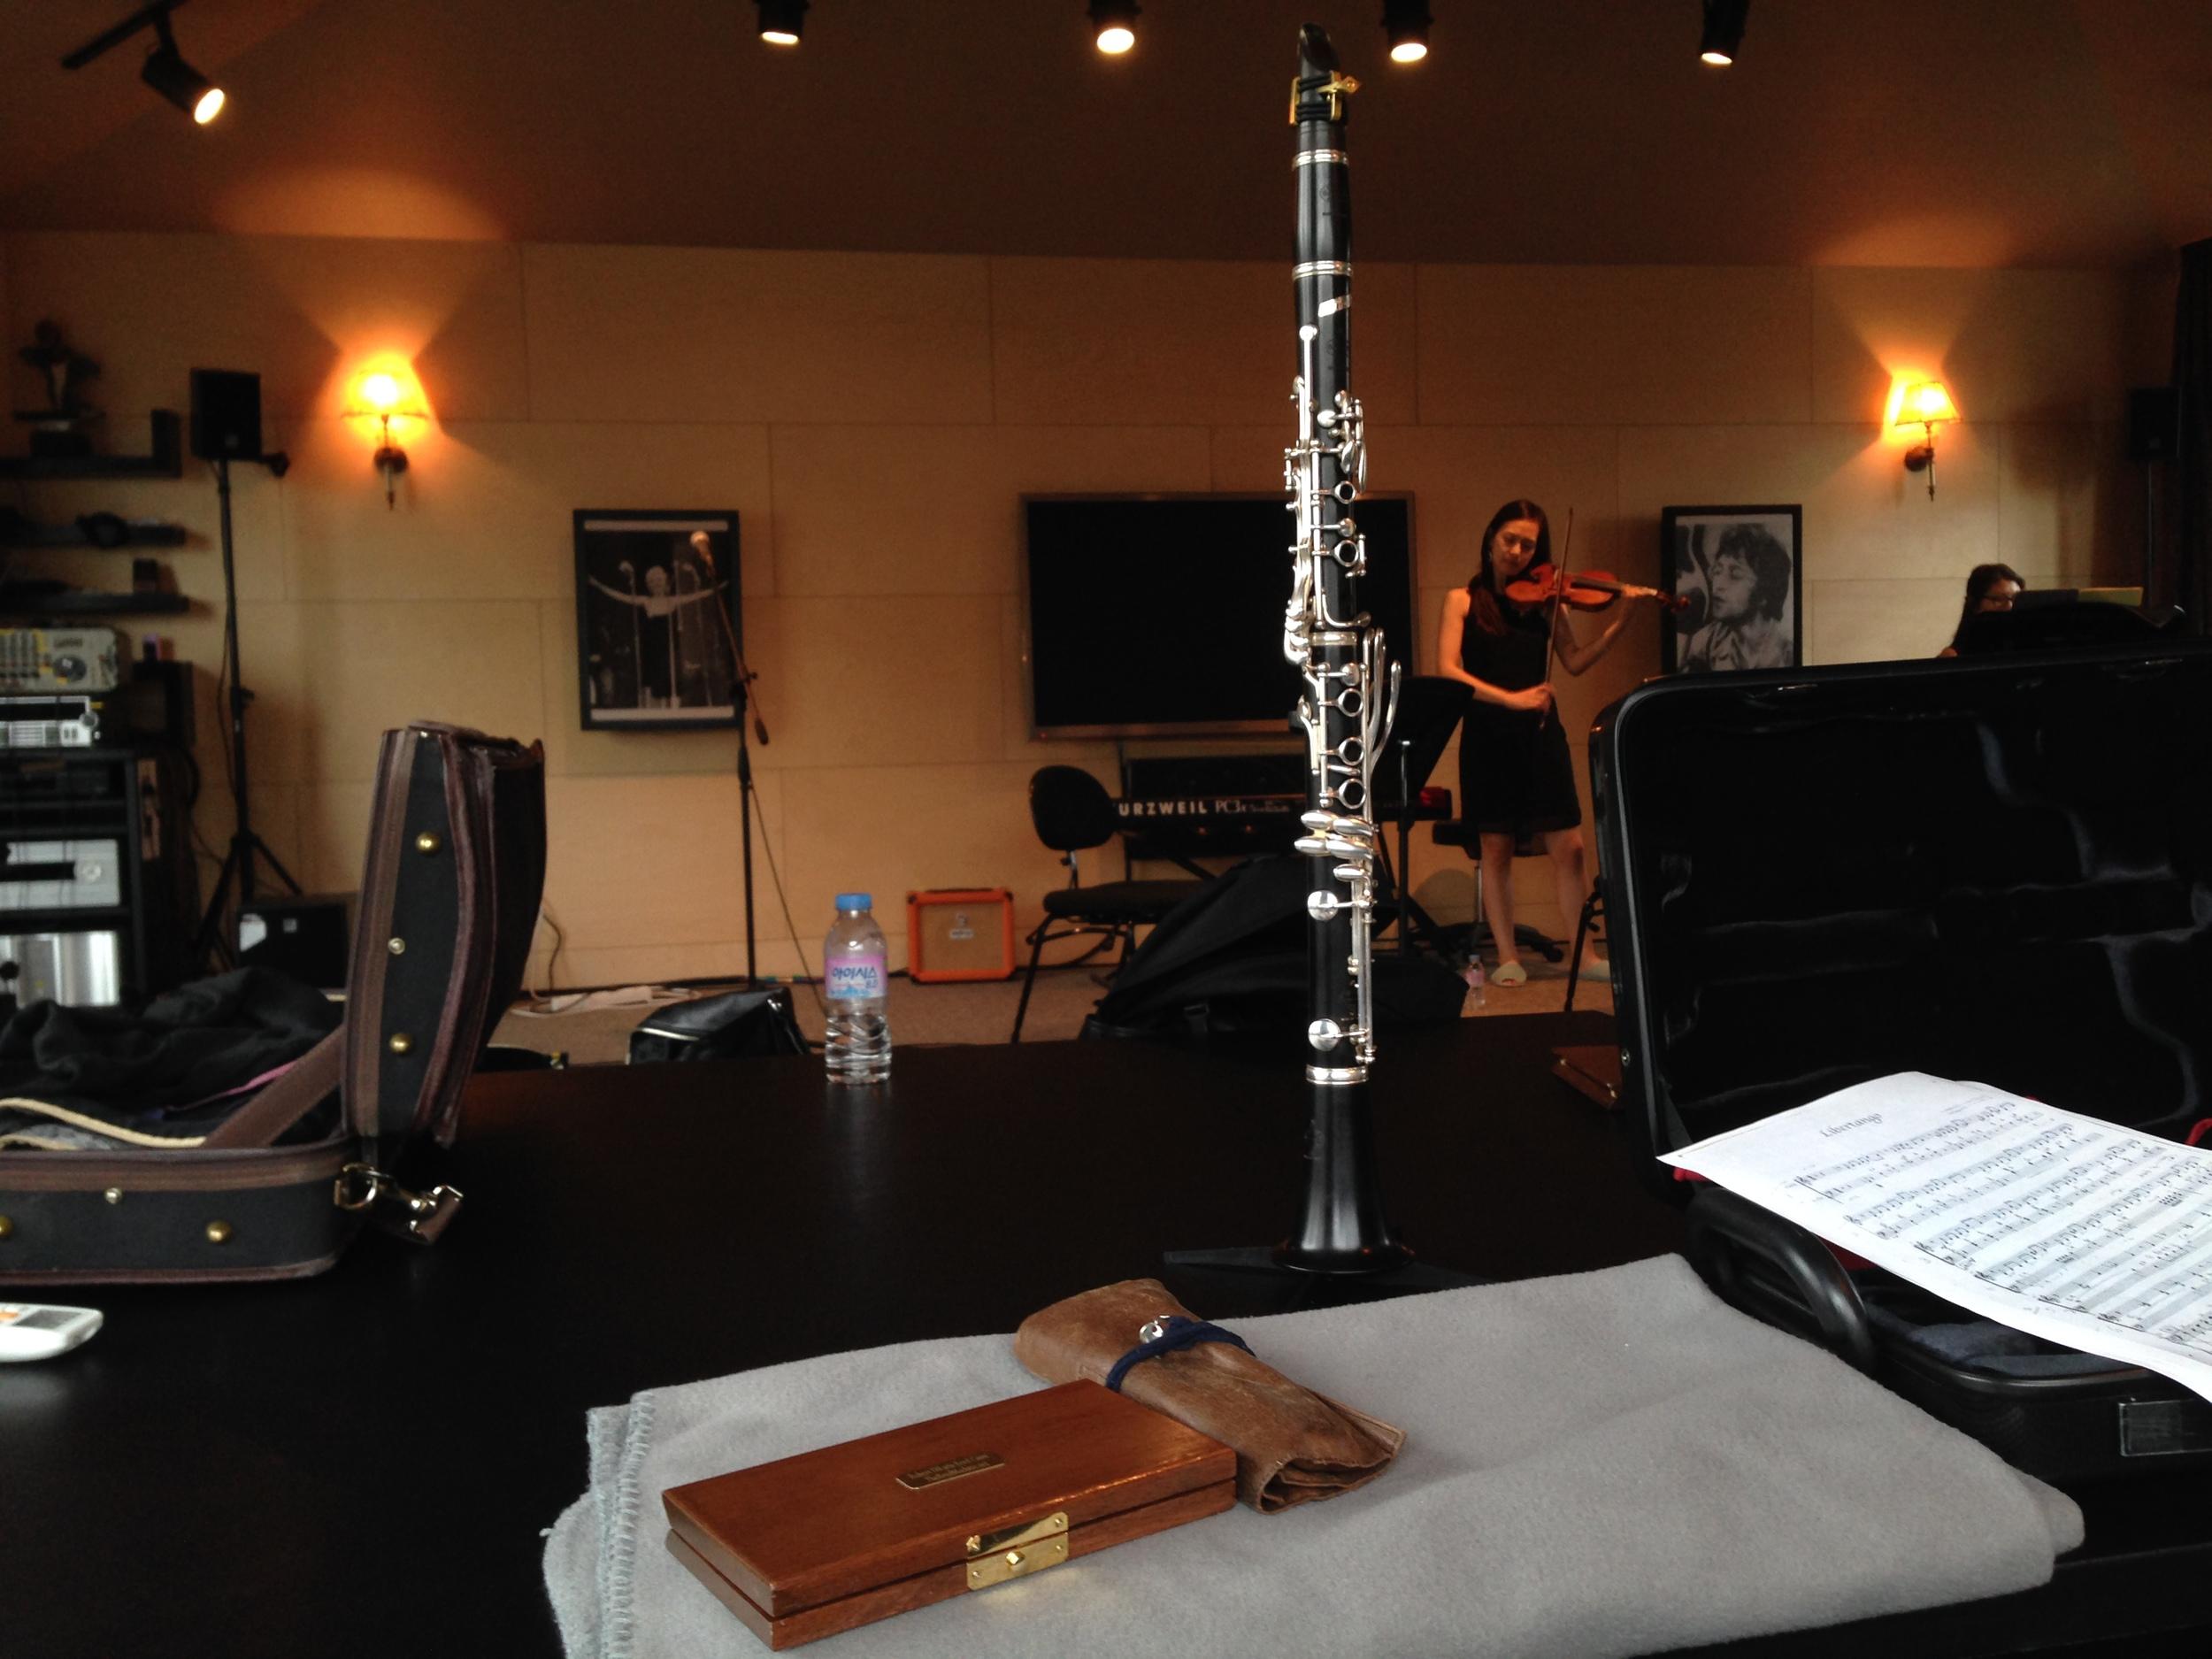 Rehearsing some trios